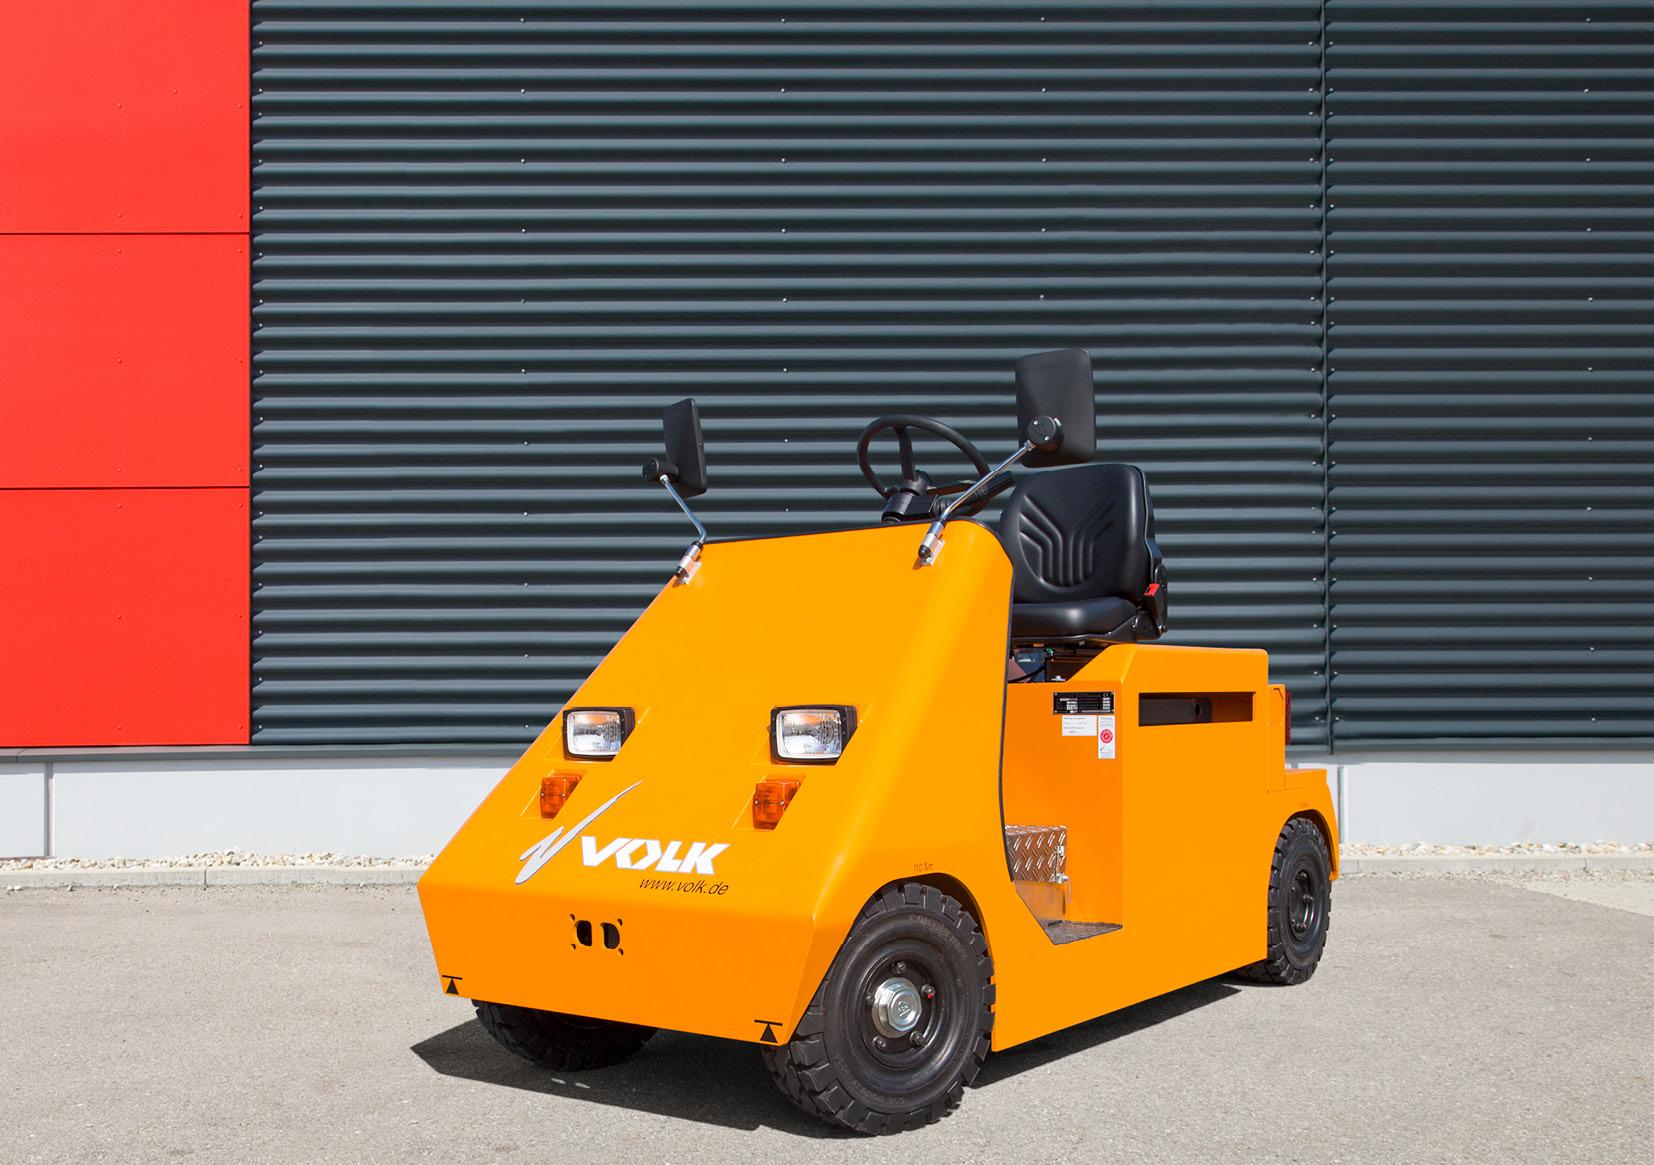 VOLK Electric tow tractor EFZ 3.5 K